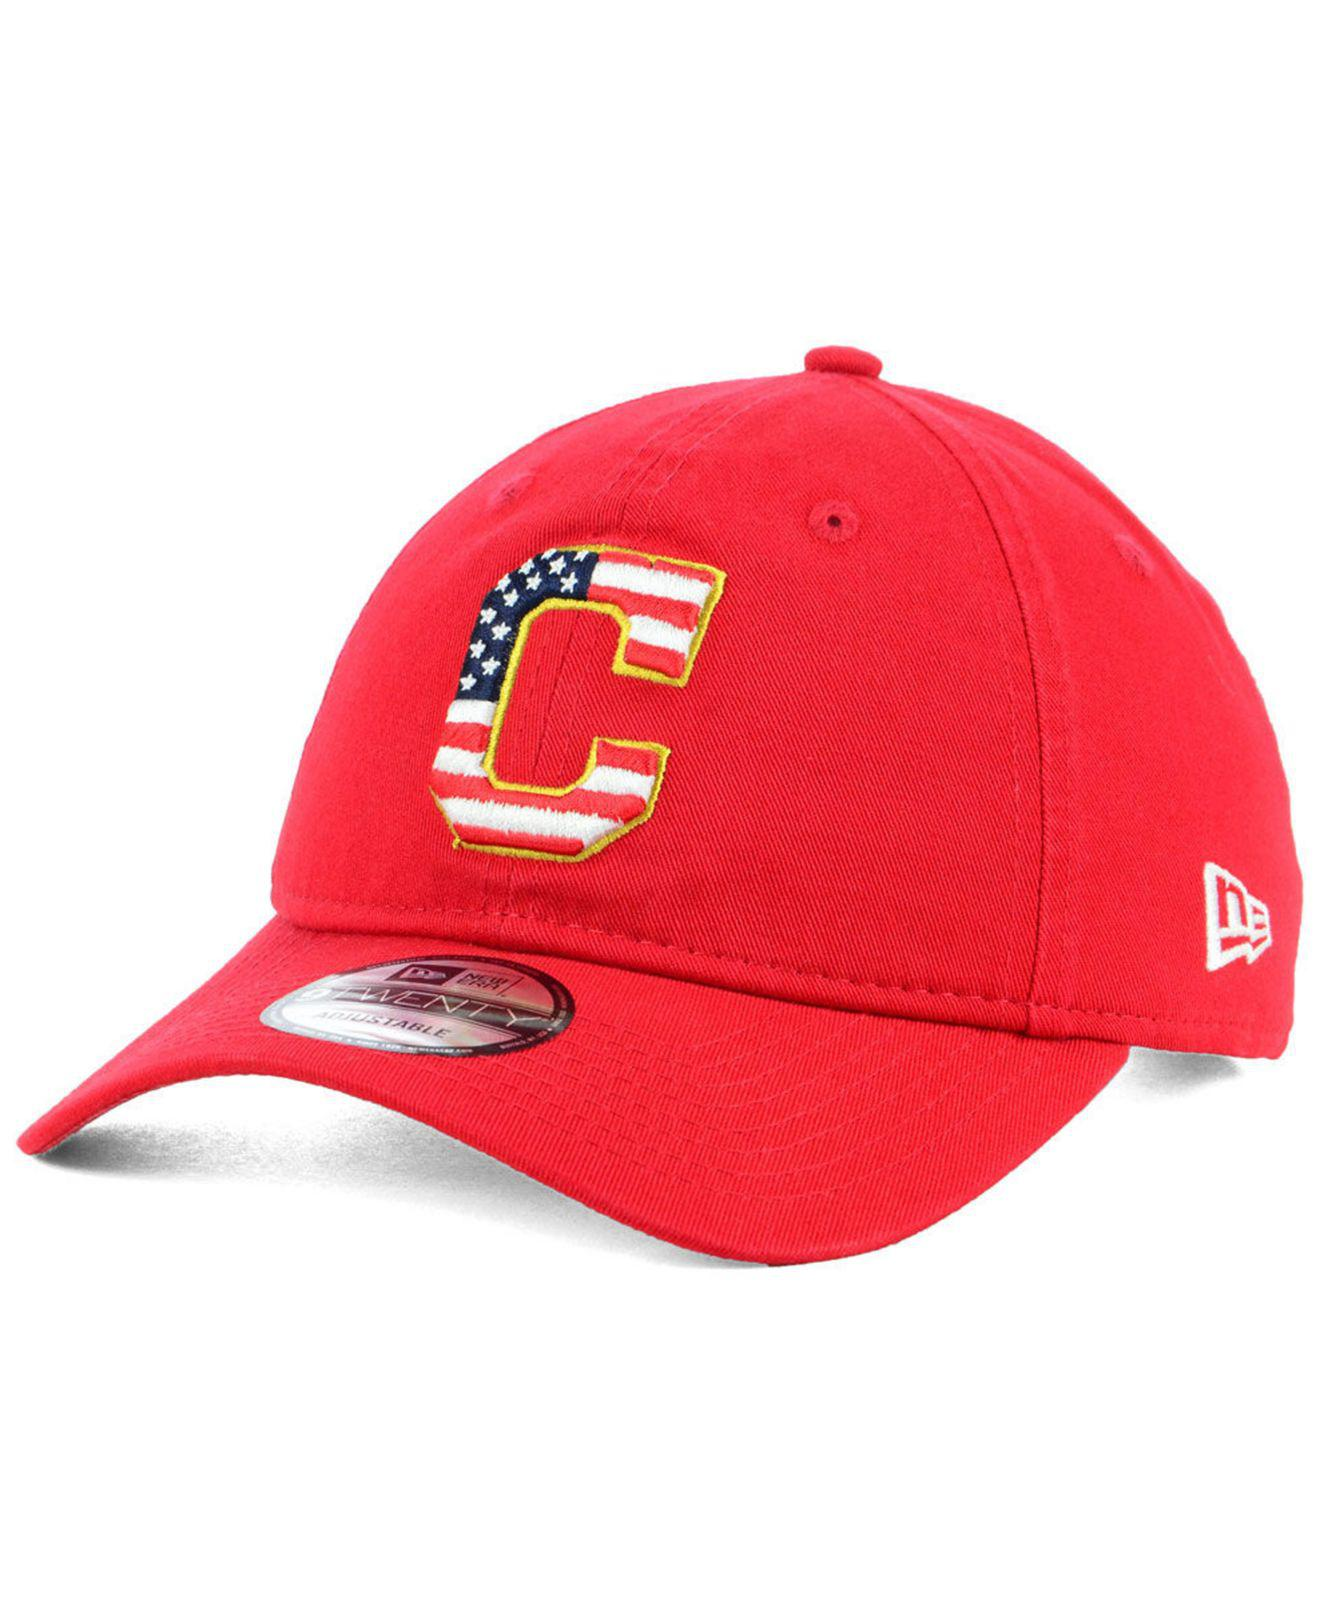 low priced 2e336 0f36a germany ky233106 mlb washington nationals caps red 2da86 d6533  get ktz.  mens red cleveland indians stars and stripes 9twenty strapback cap f1a60  2e6bc